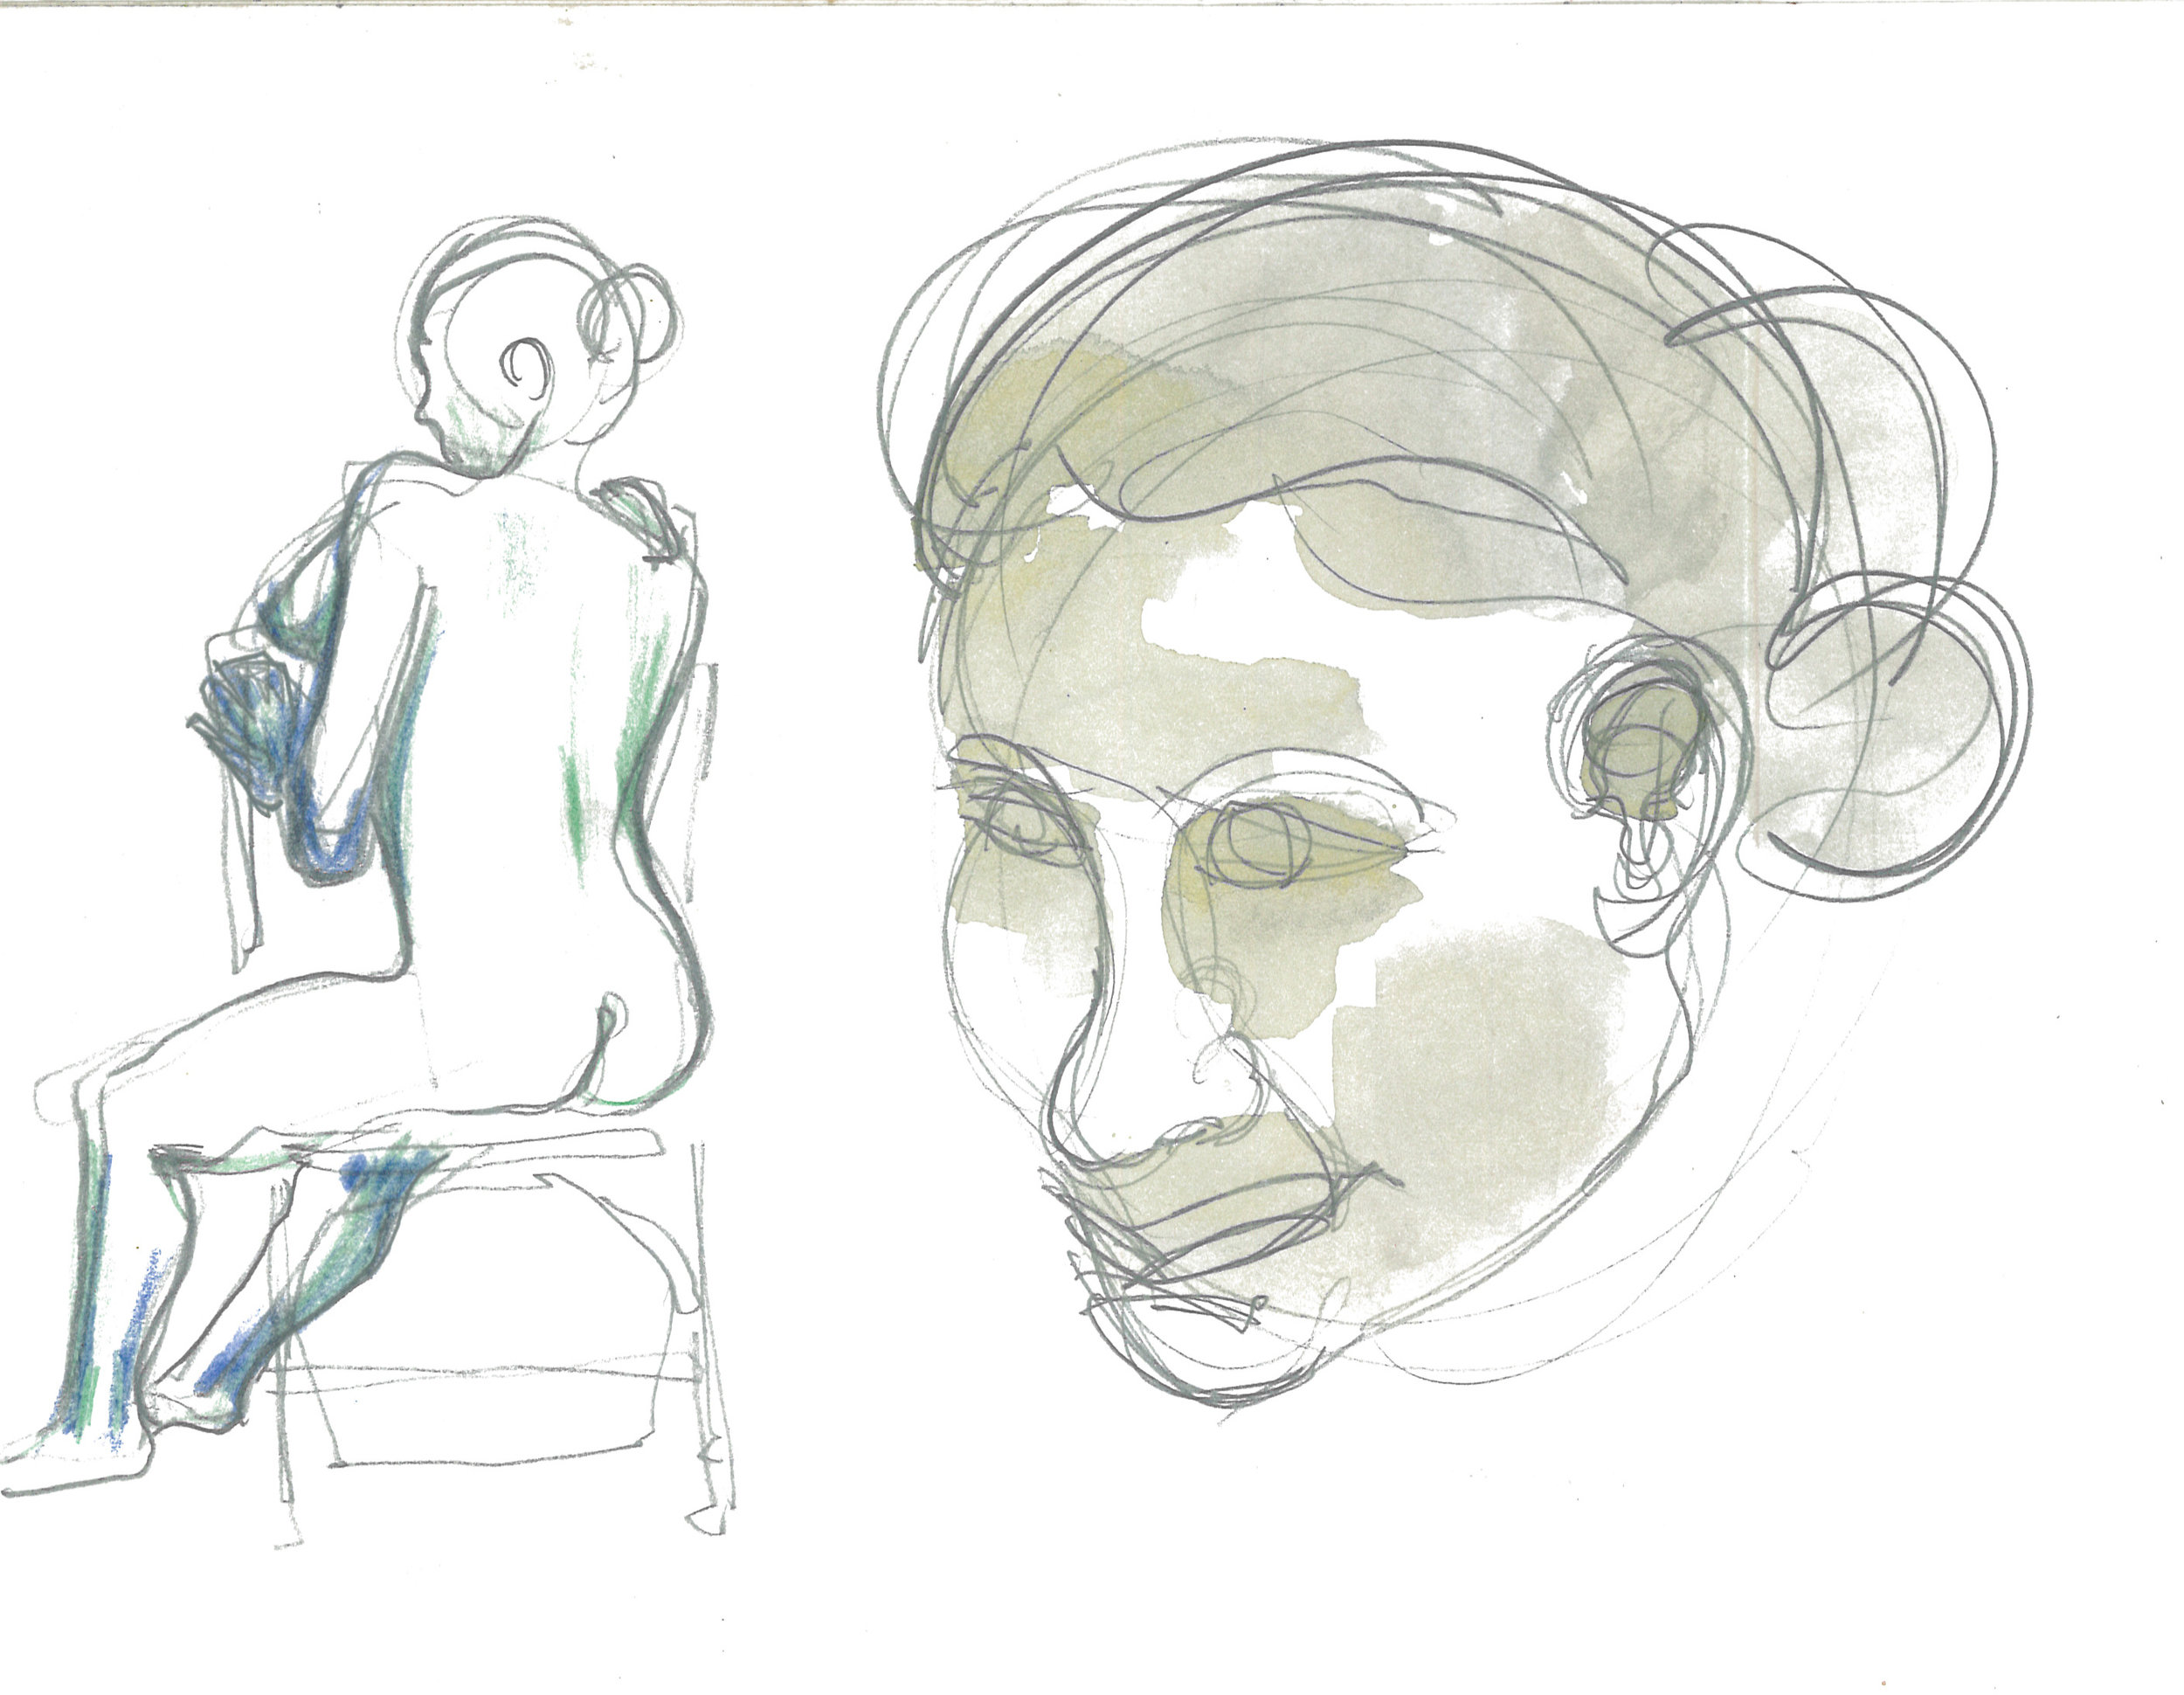 FIGURE_SketchbookA_ScanC_Page_10.jpg